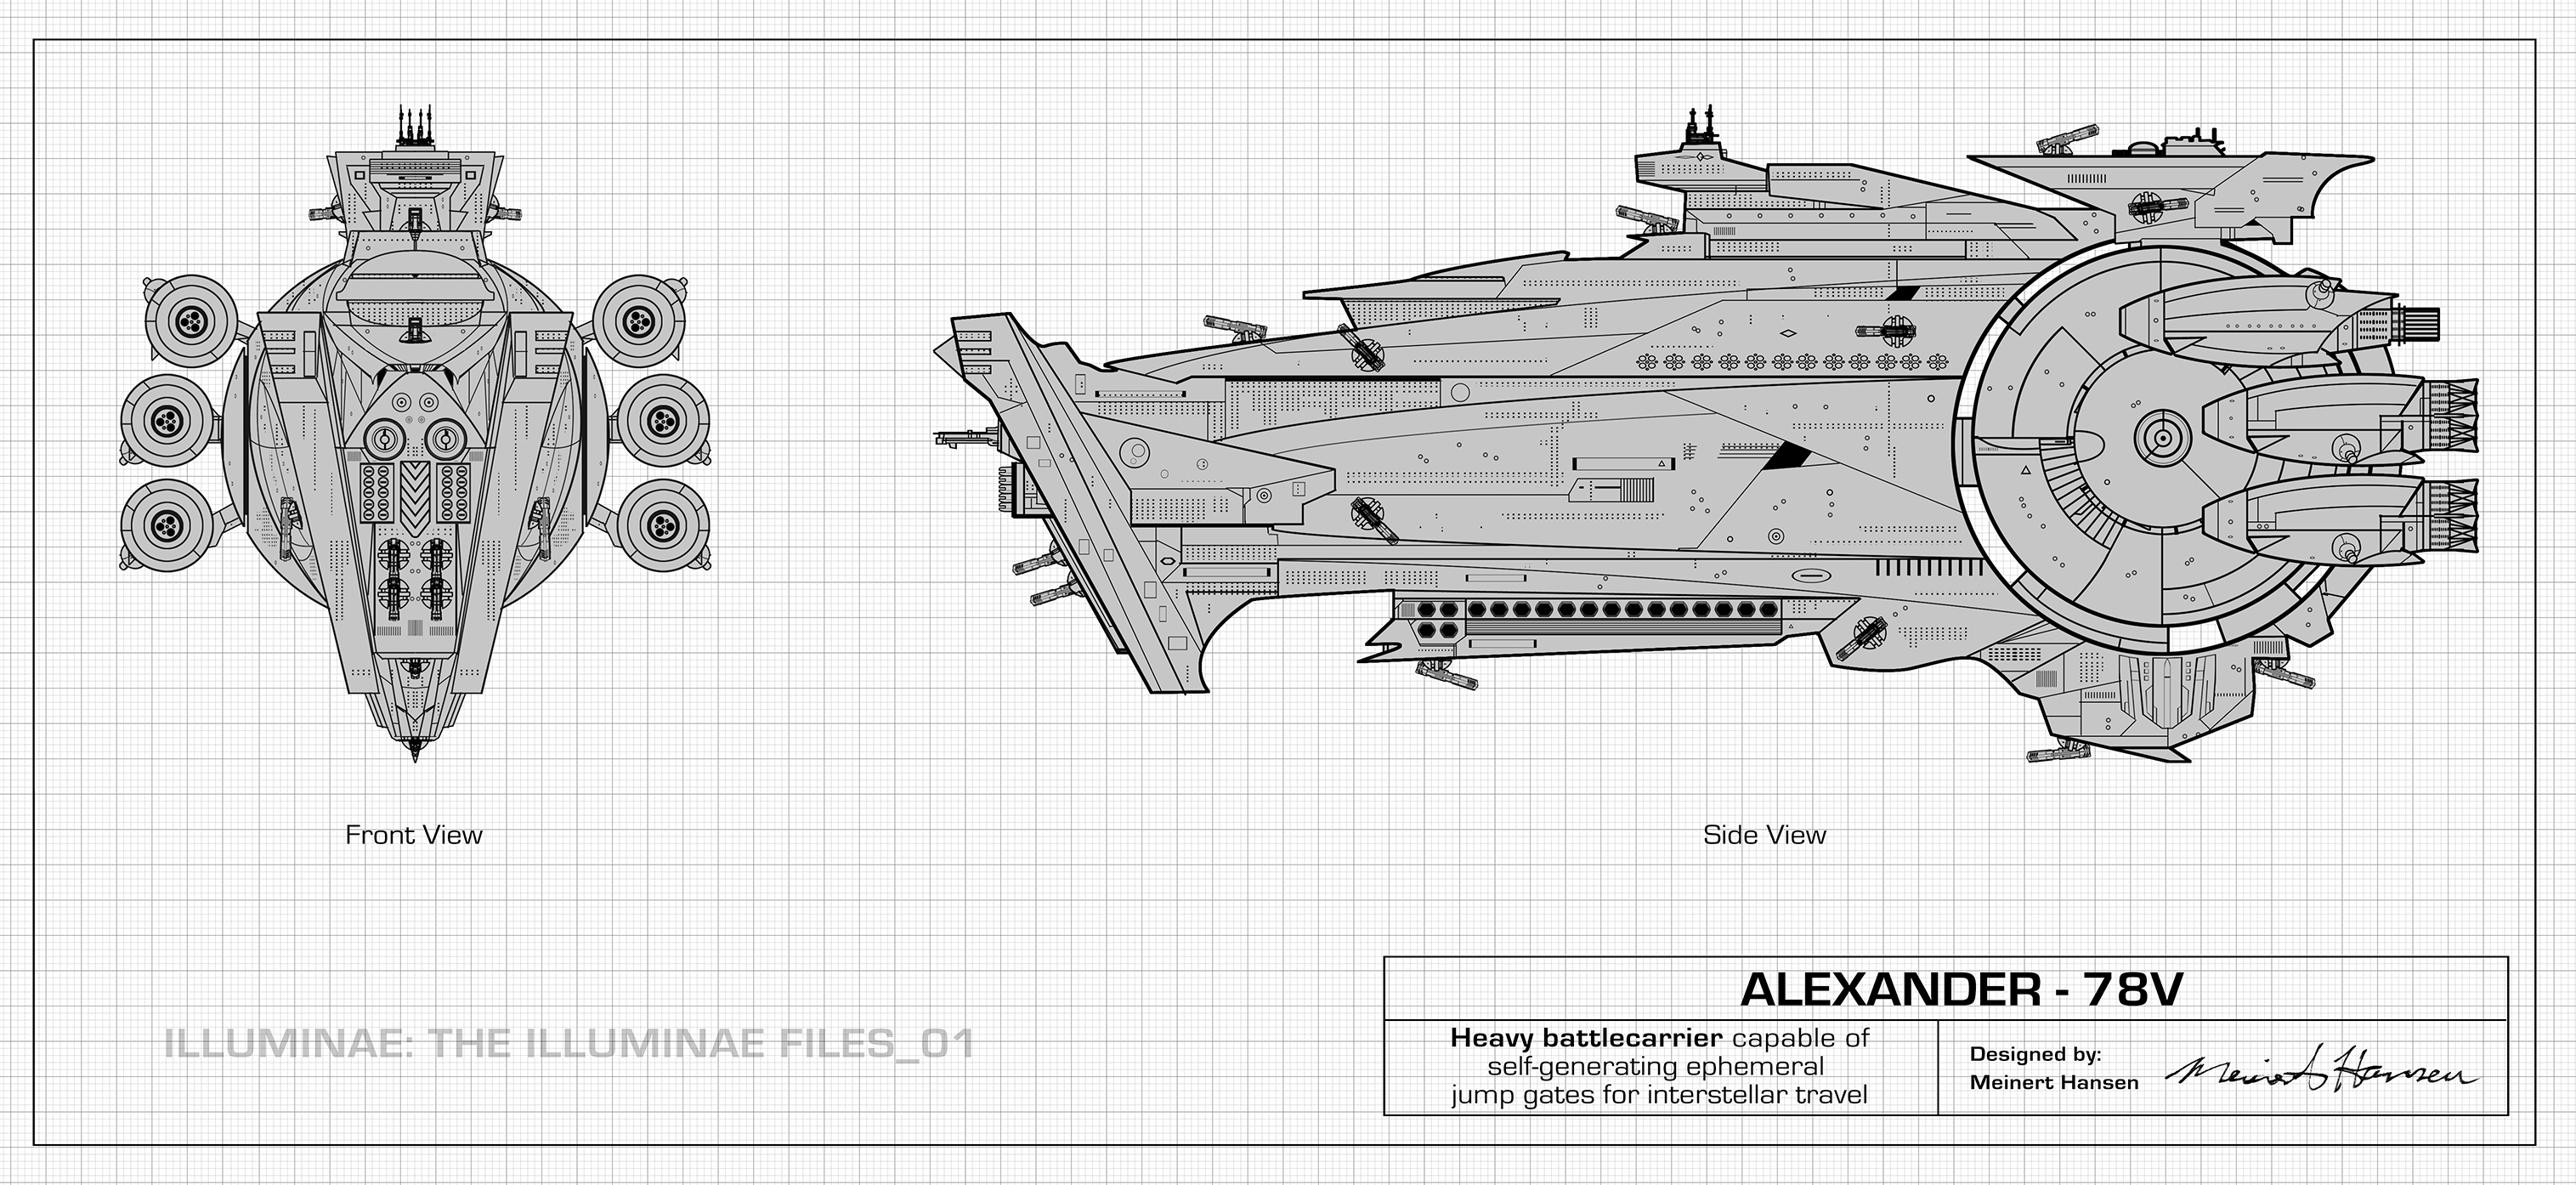 illuminae the illuminae files 01 spaceship designs. Black Bedroom Furniture Sets. Home Design Ideas